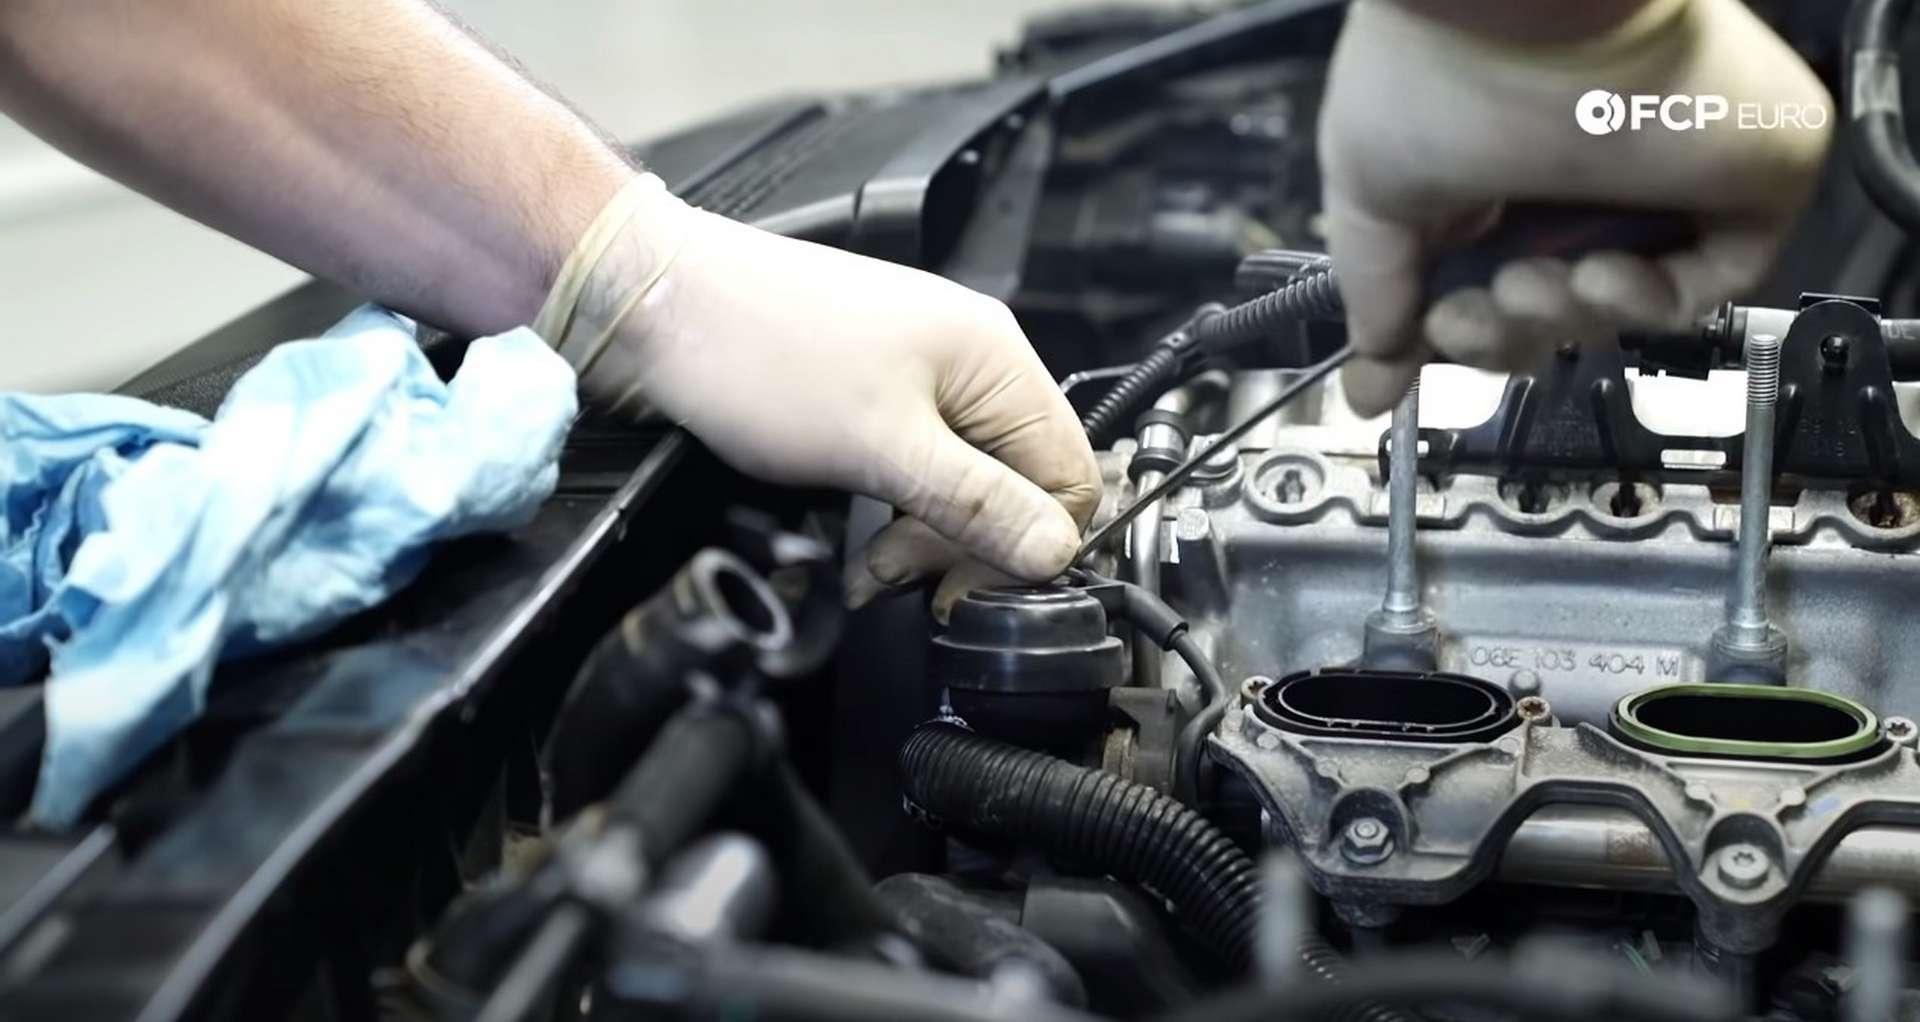 DIY Audi 3.0t Walnut Blasting Intake Valves disconnecting the short vacuum line